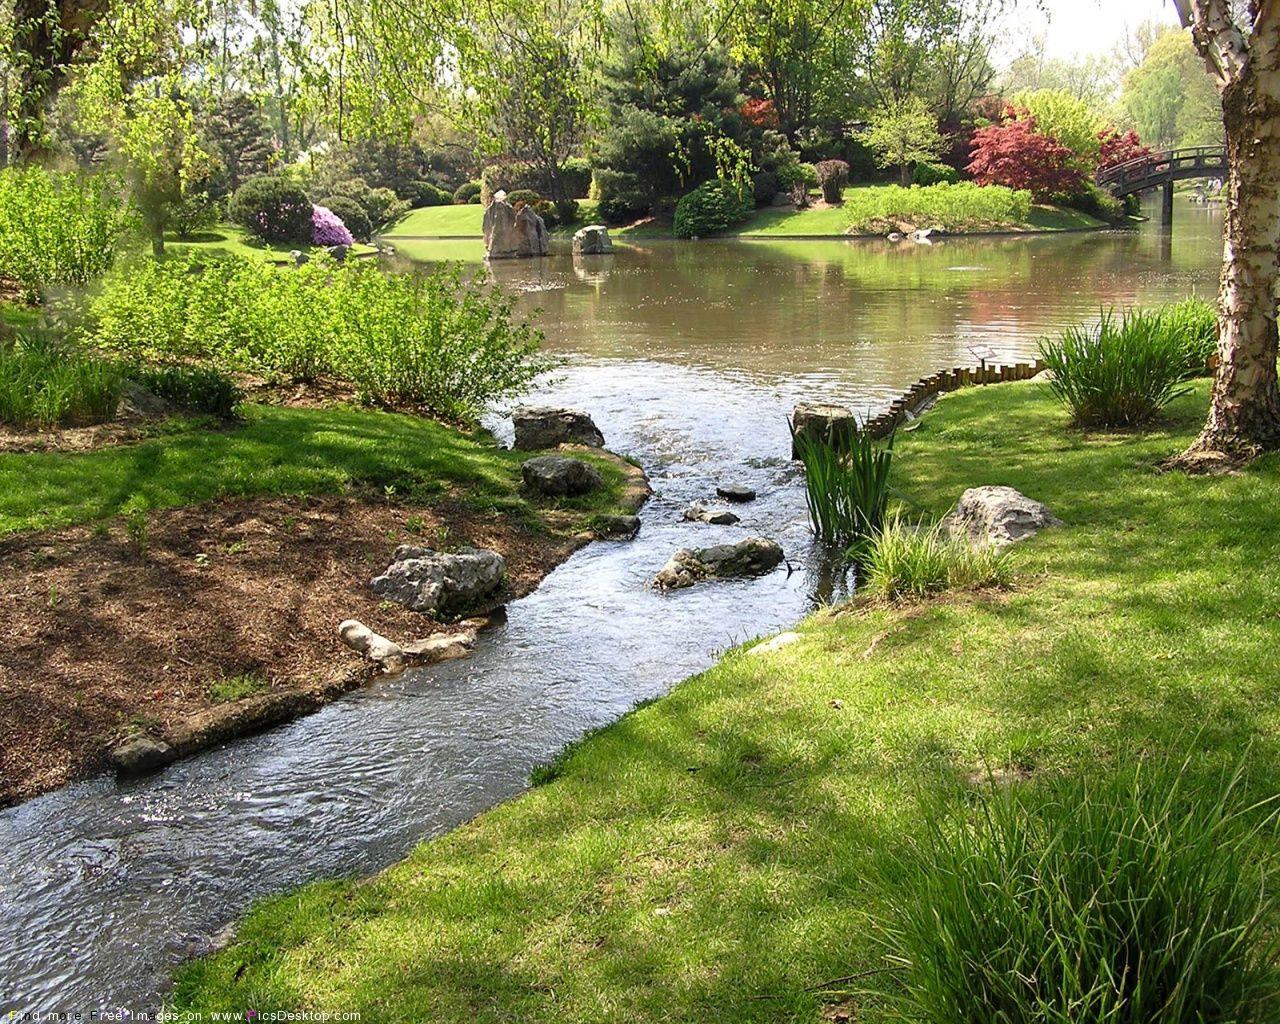 Nature Springtime Free Desktop Wallpapers For Pc Mac 12 Garden Stream Spring Time Nature